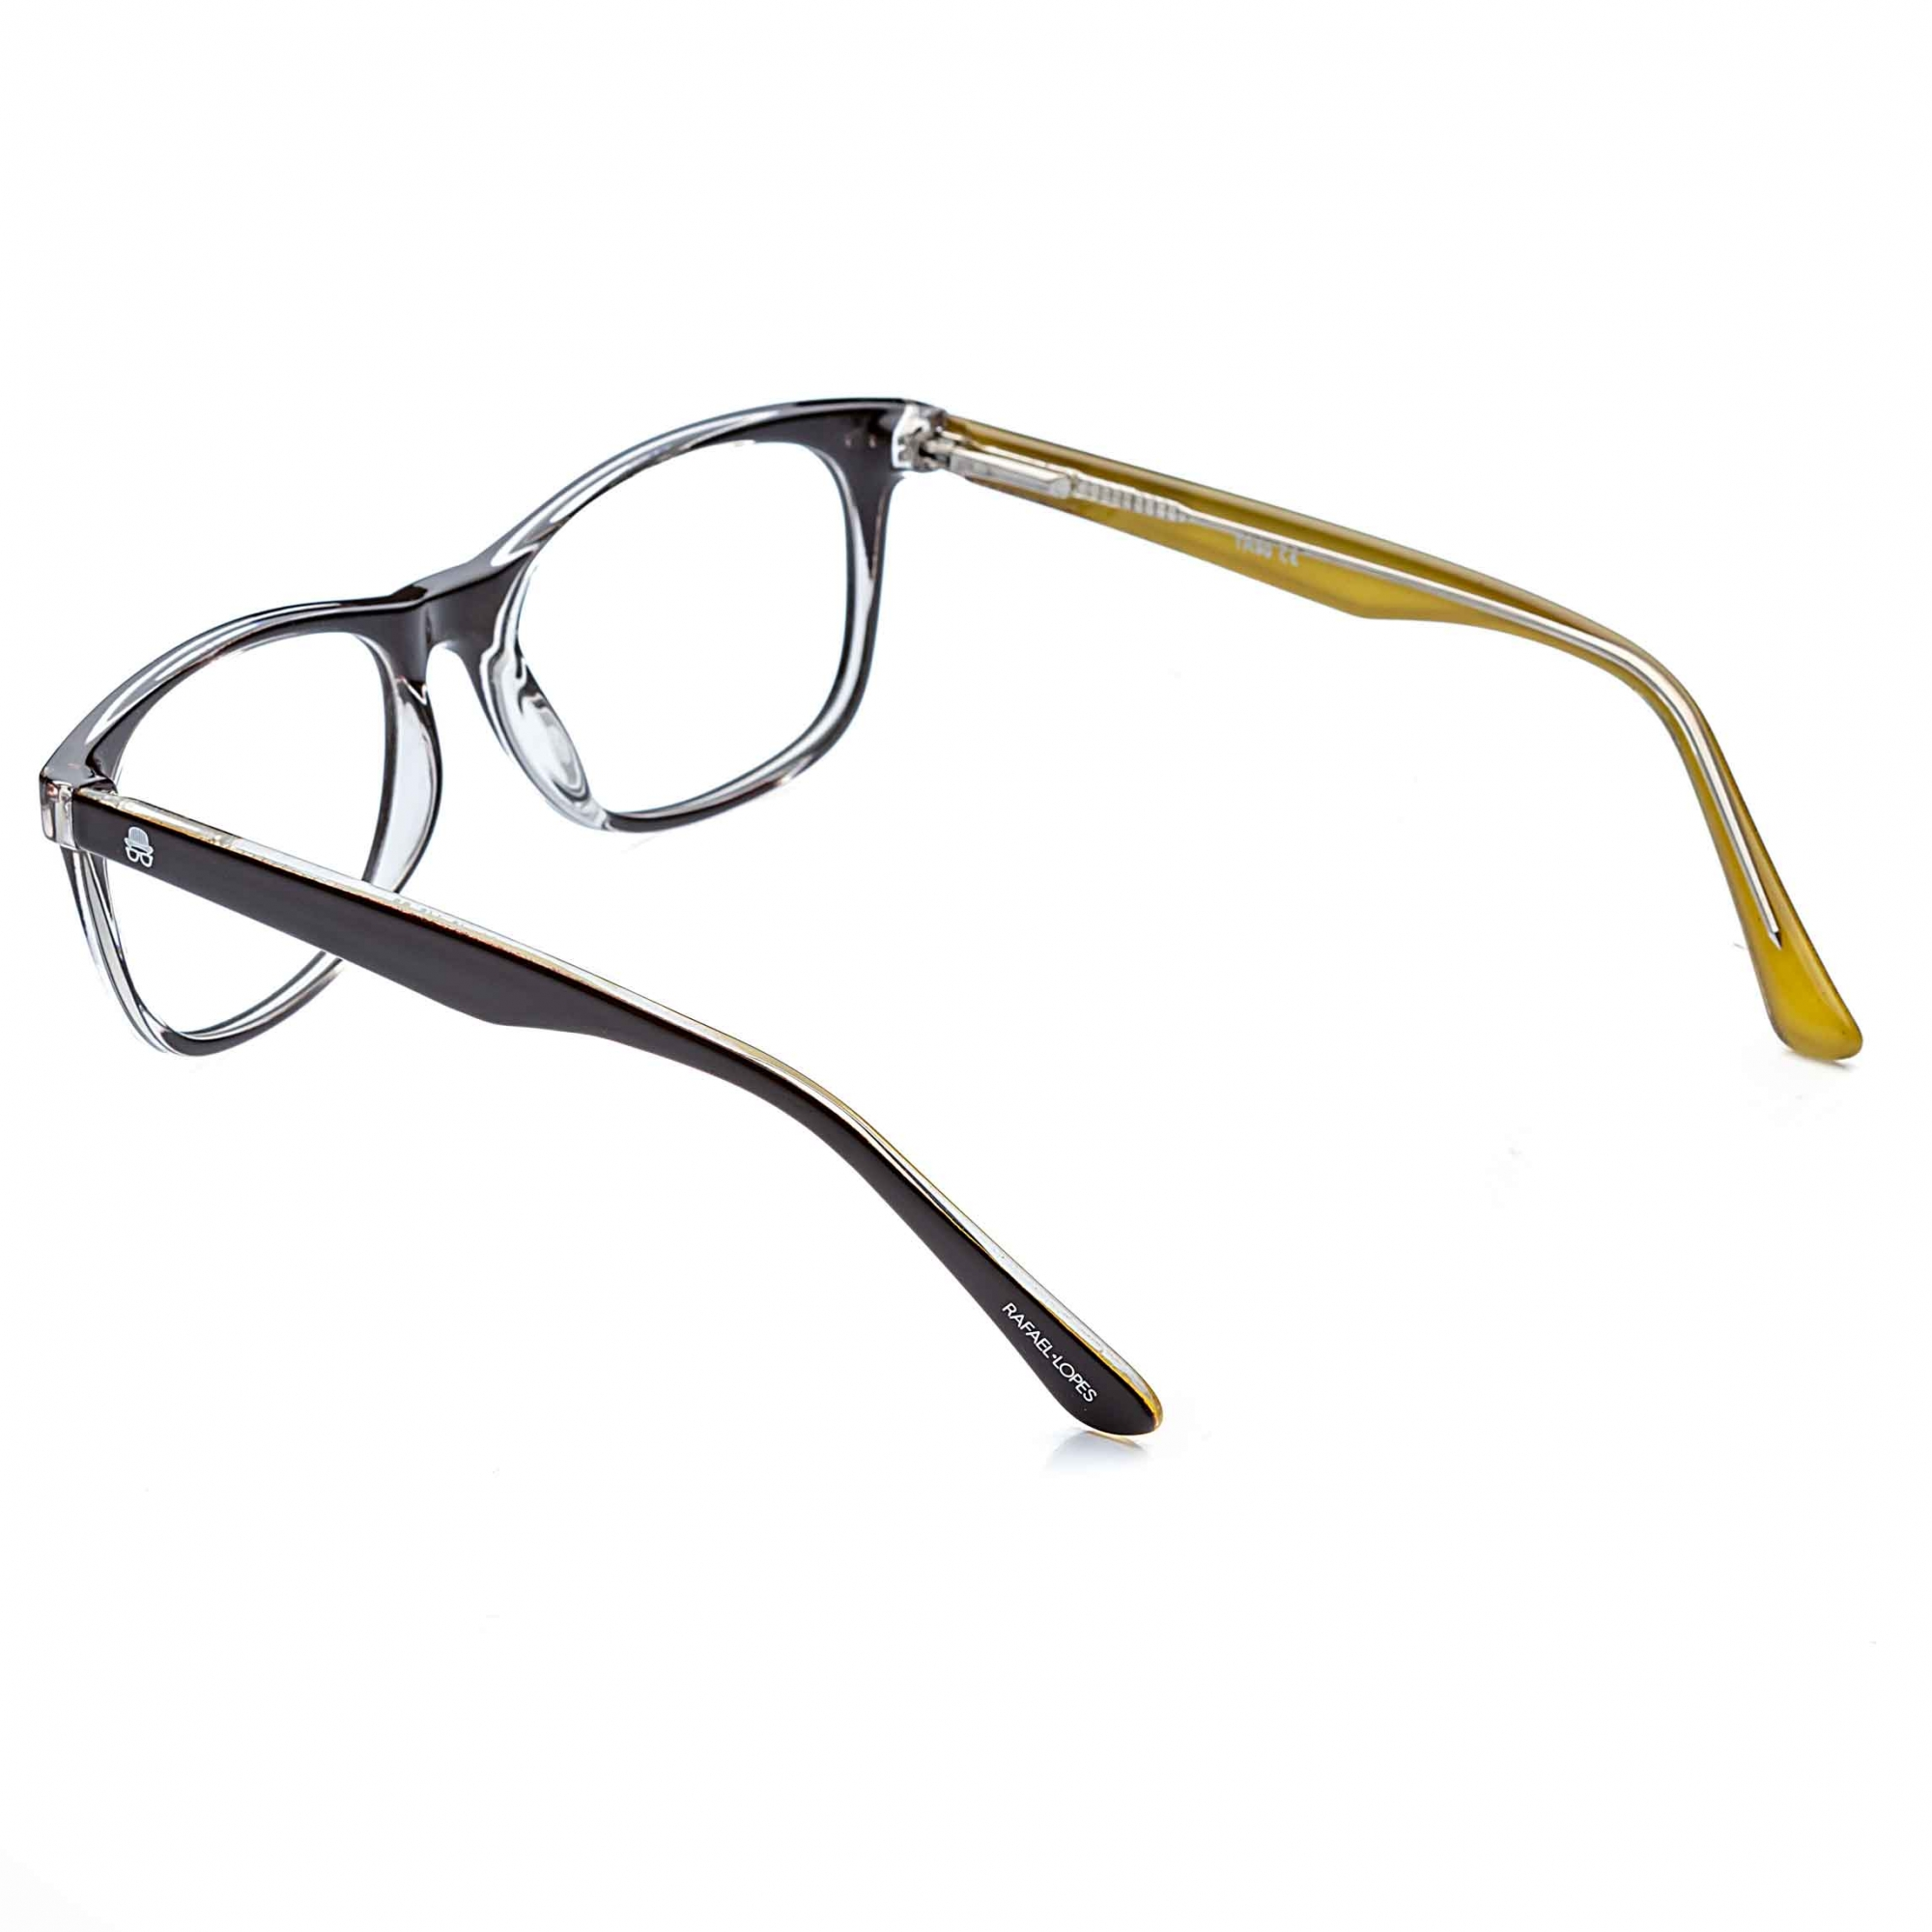 Katrine - Rafael Lopes  Eyewear